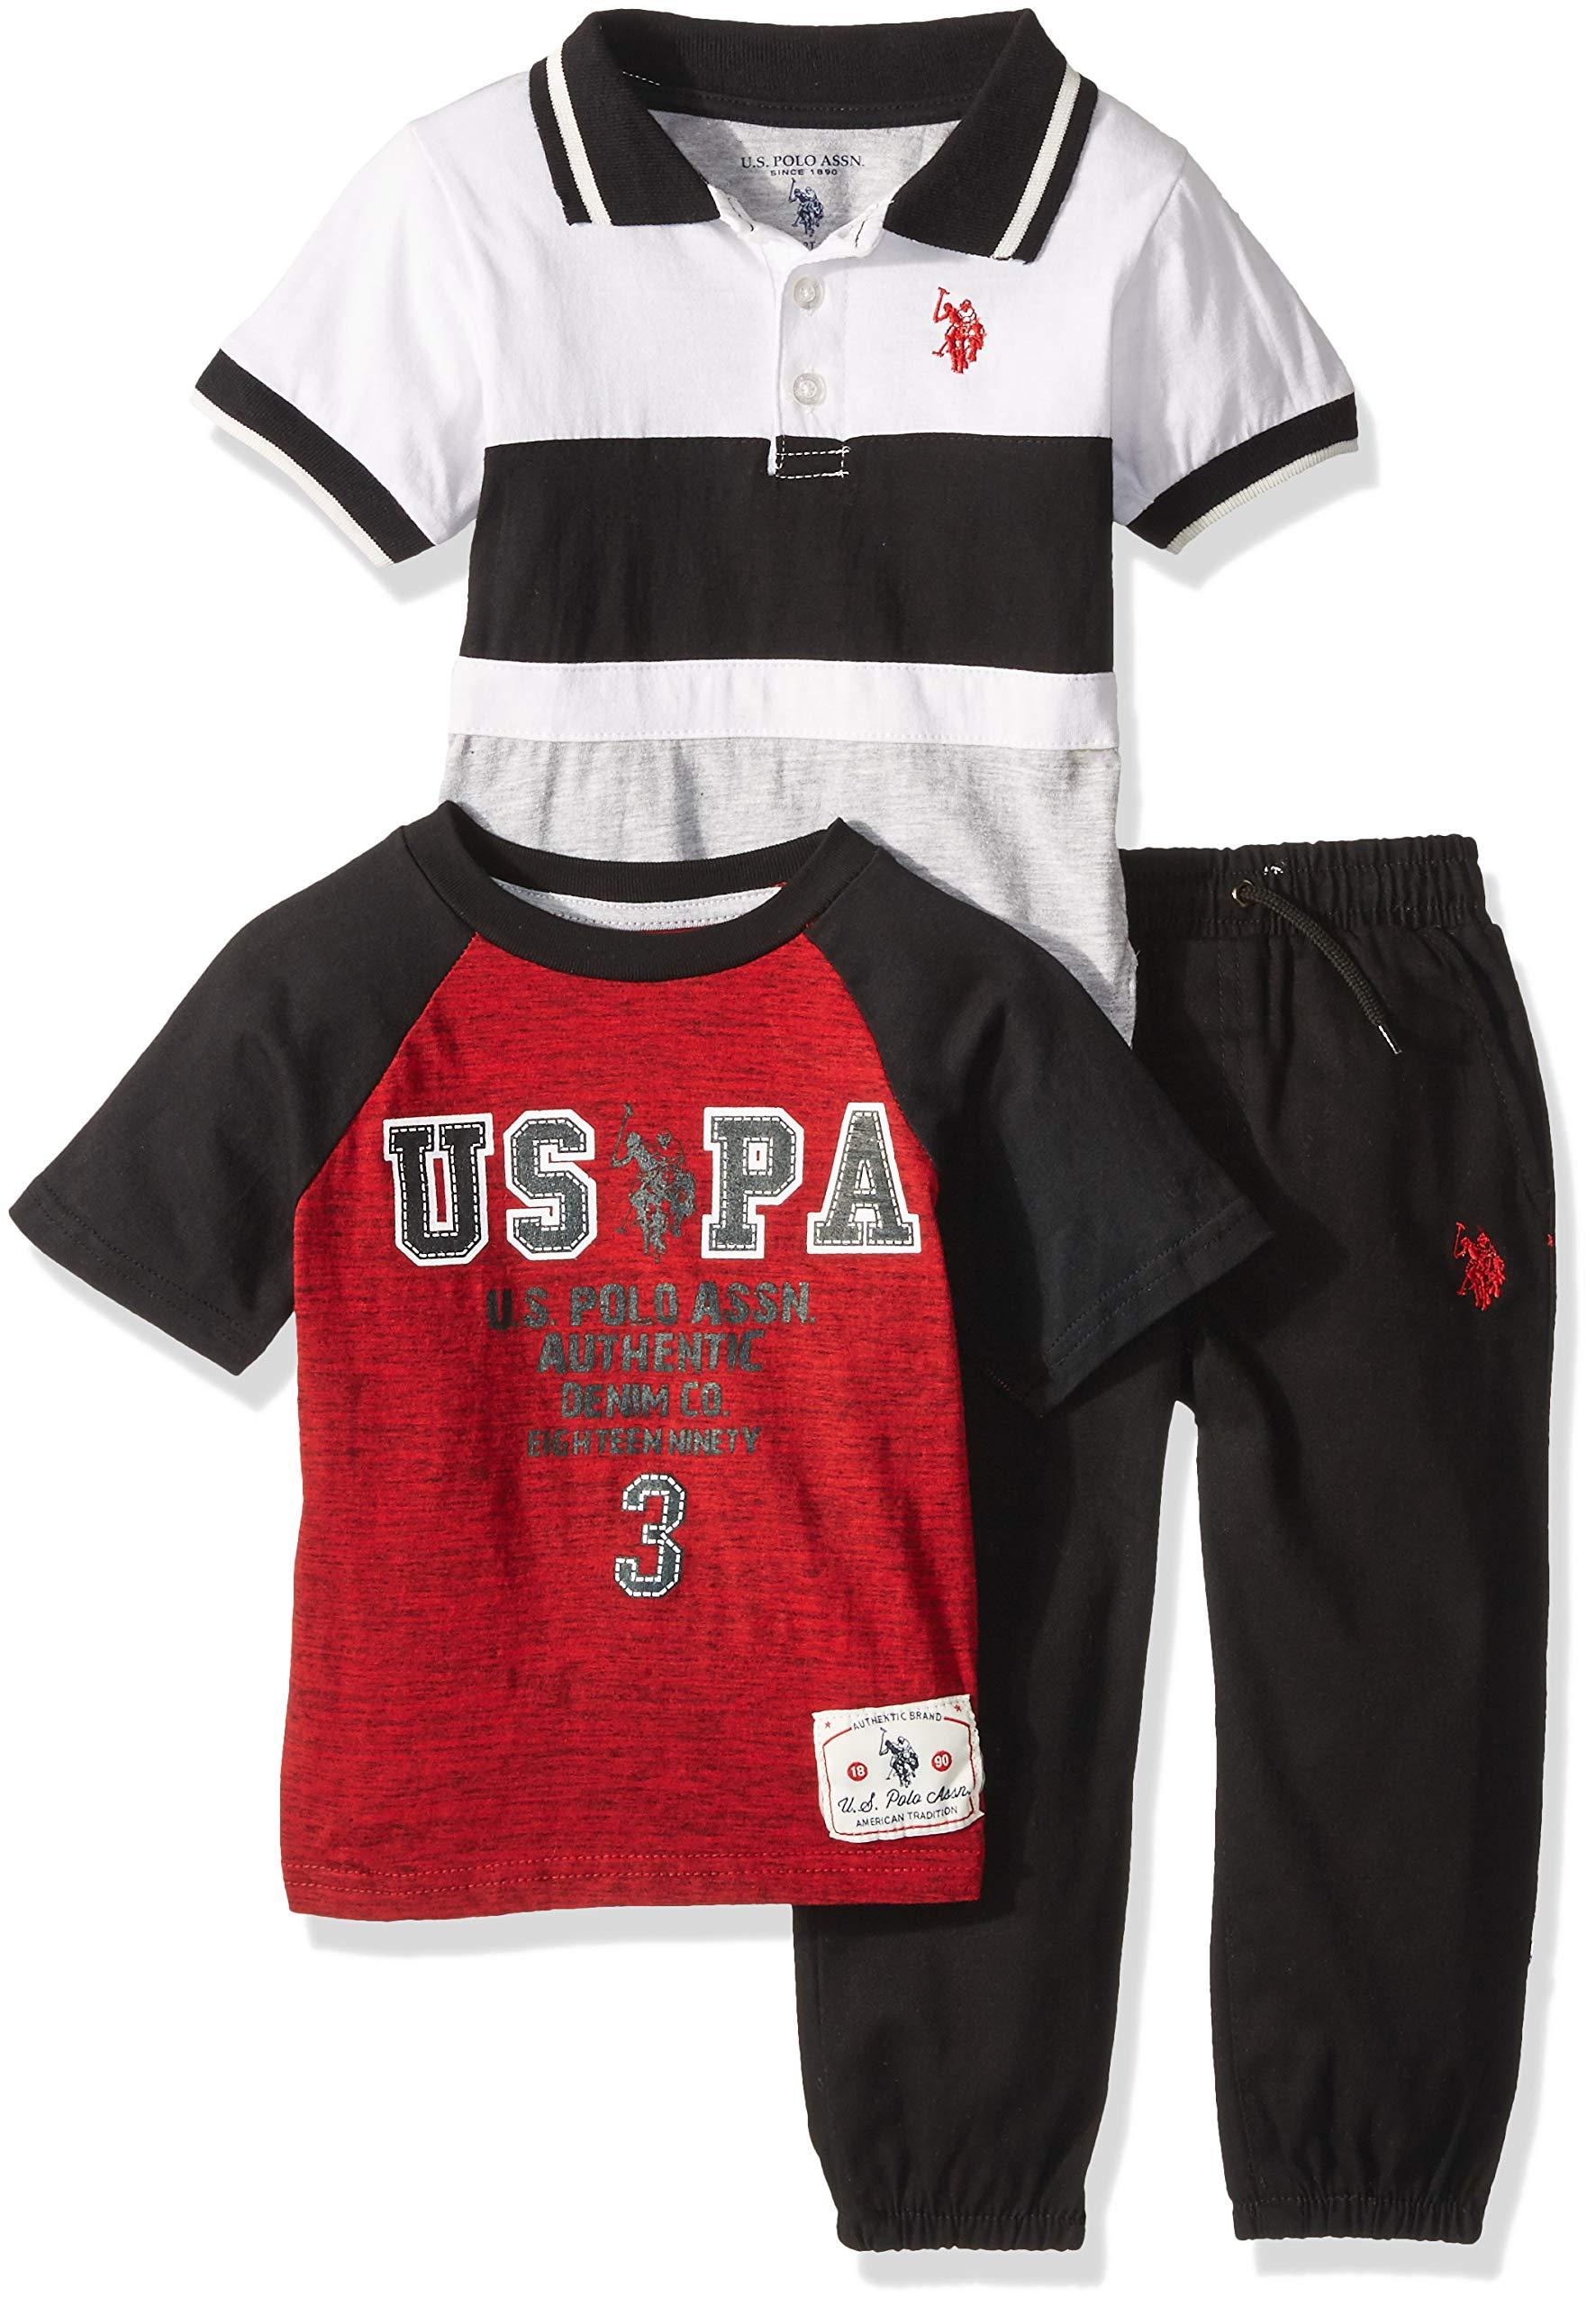 U.S. Polo Assn. Boys' Big Polo, T-Shirt and Pant Set, Authentic Denim Black, 10